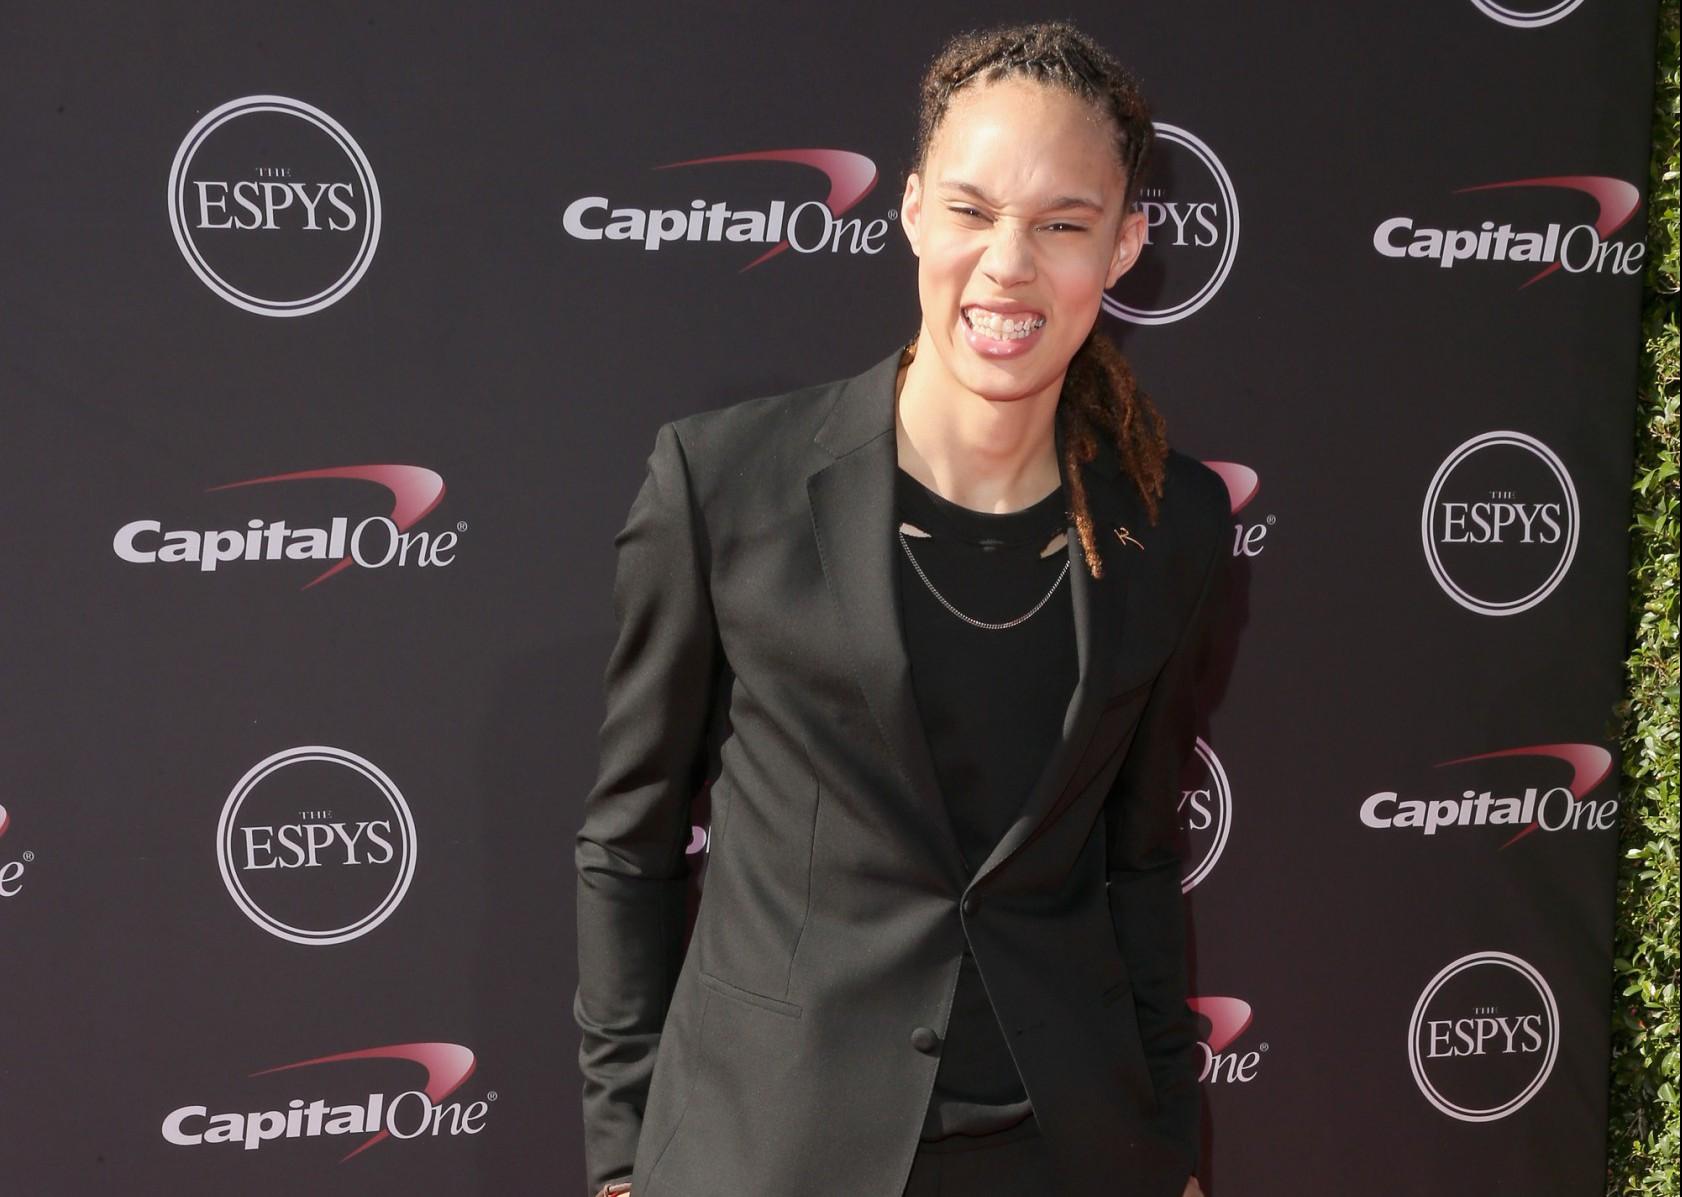 The 2013 ESPY Awards - Arrivals